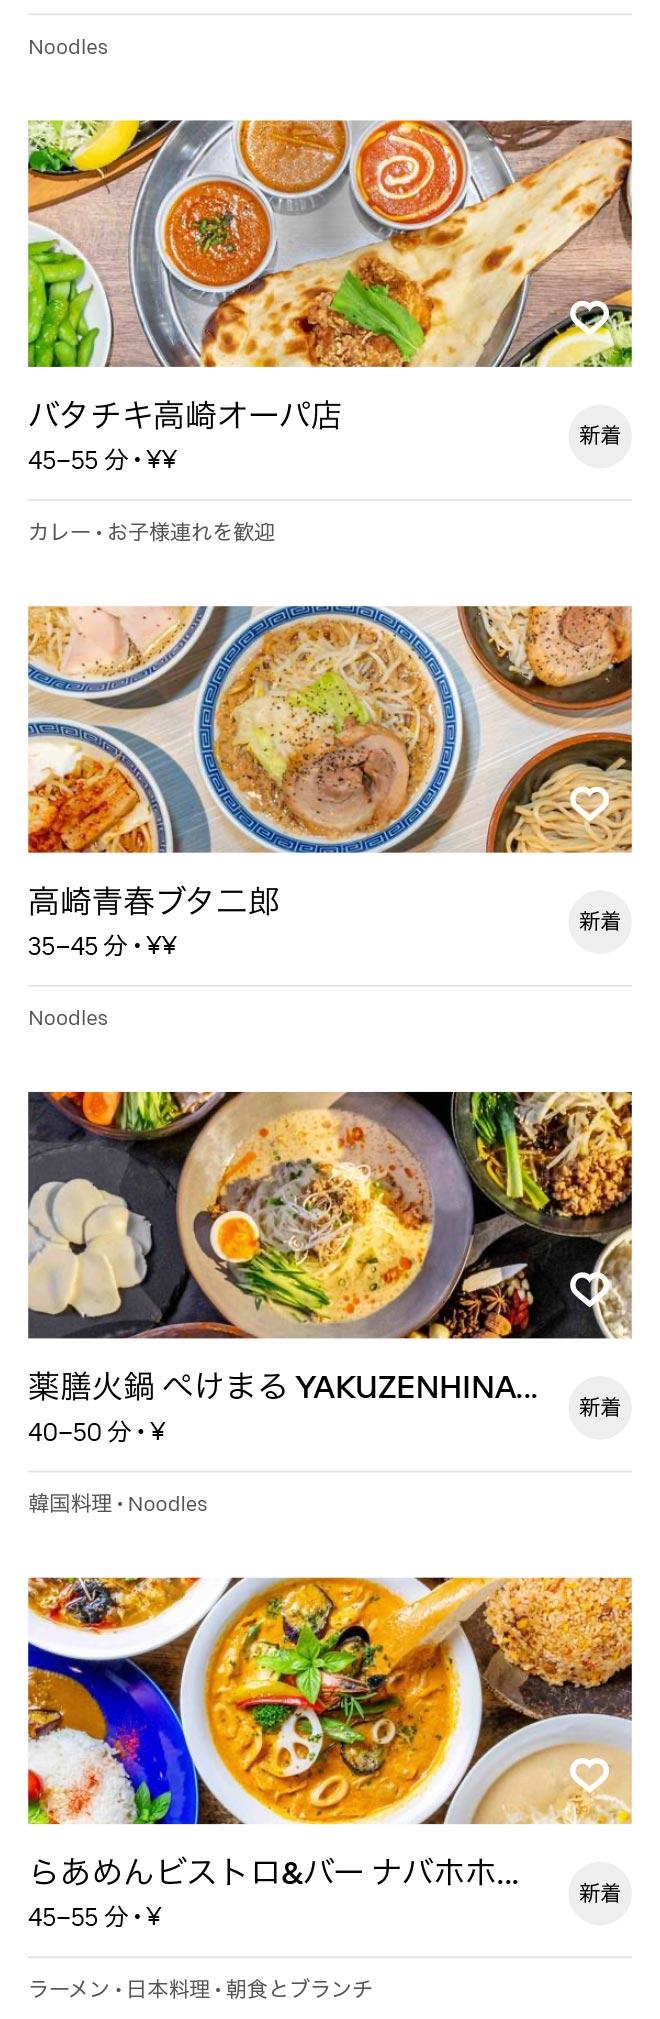 Takasaki menu 2009 2